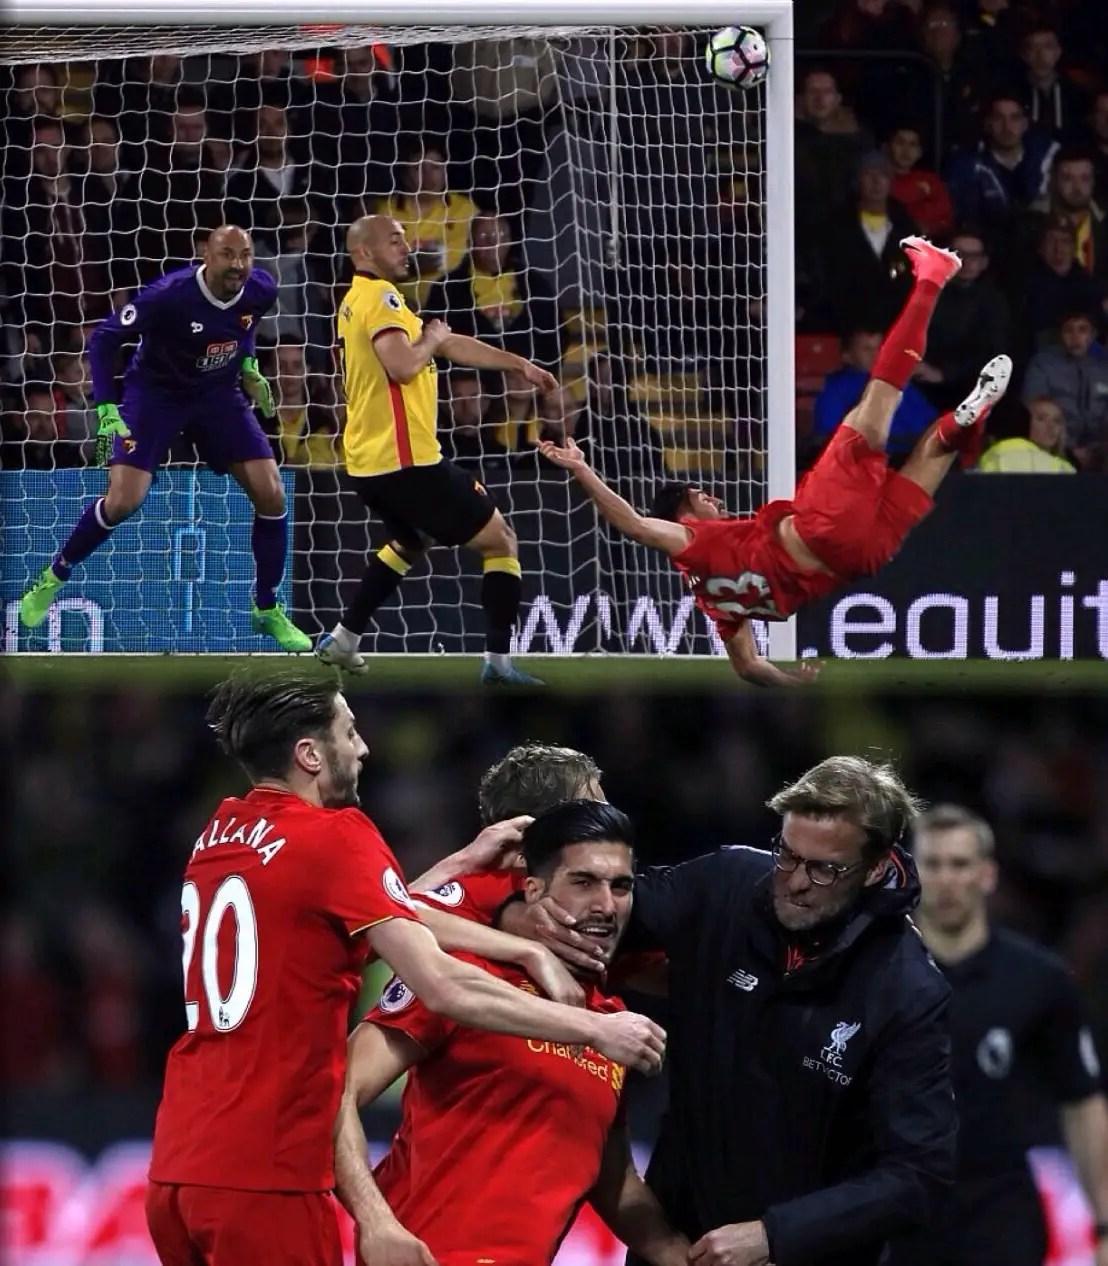 Klopp Hails Can's 'Spectacular' Goal Vs Watford; Midfielder Celebrates 'My Best Goal Ever'